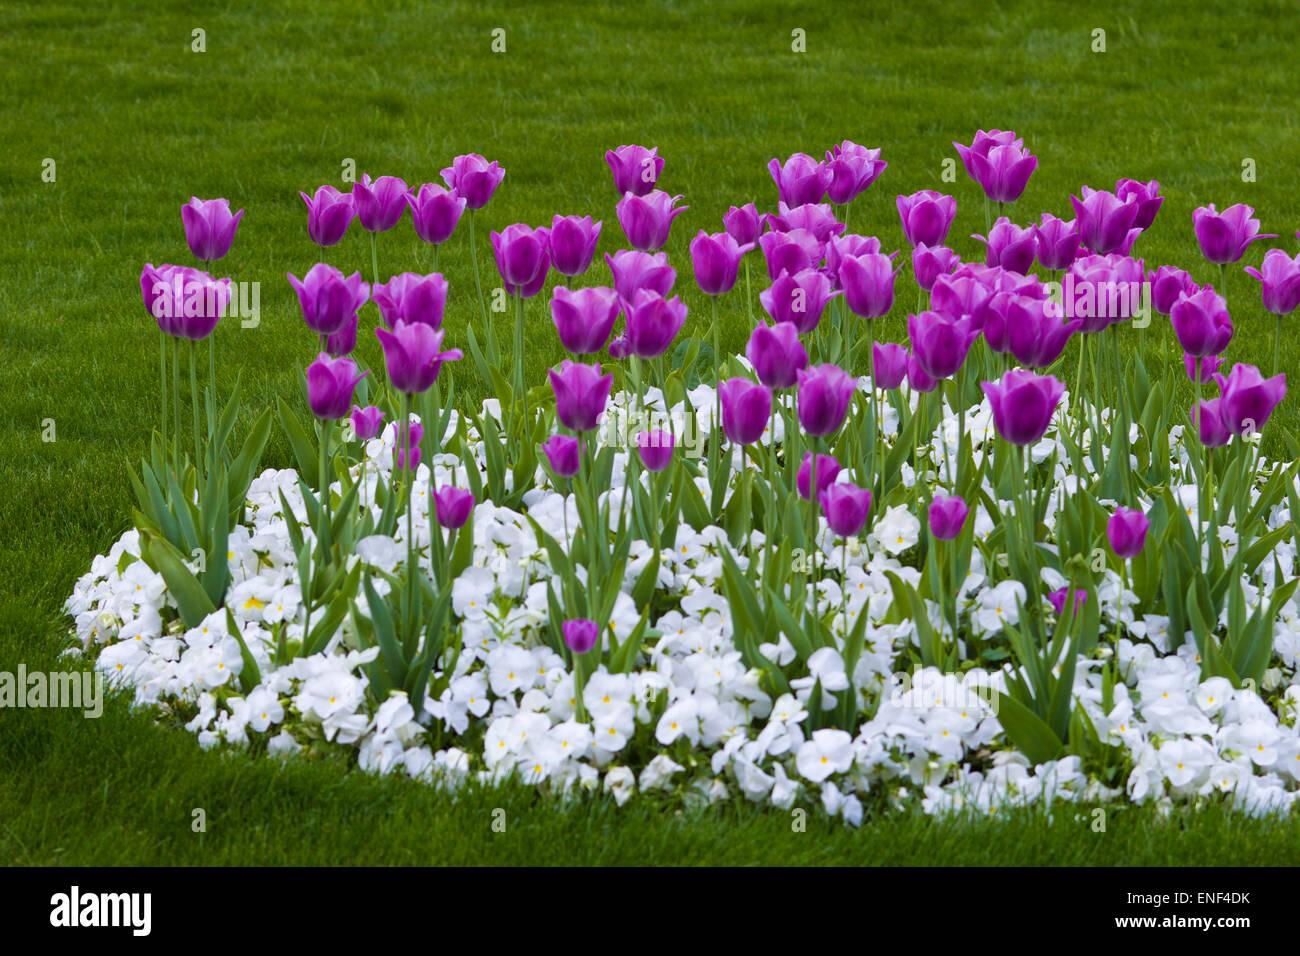 Row Flower Garden : Flower tulips row gardening garden border panorama